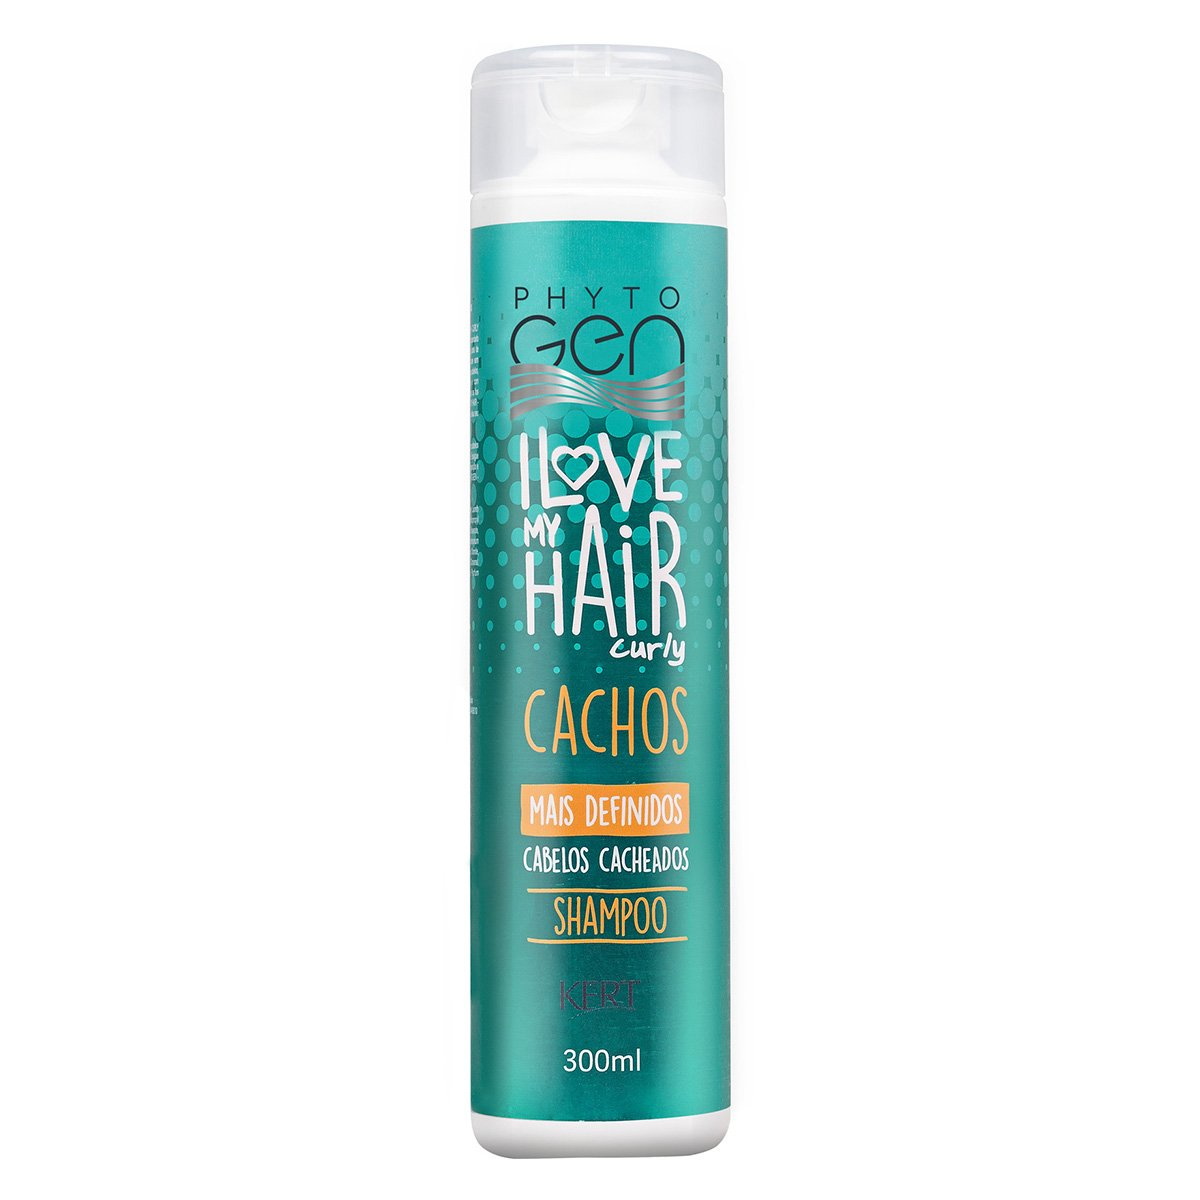 Shampoo Phytogen I Love My Hair 300ml